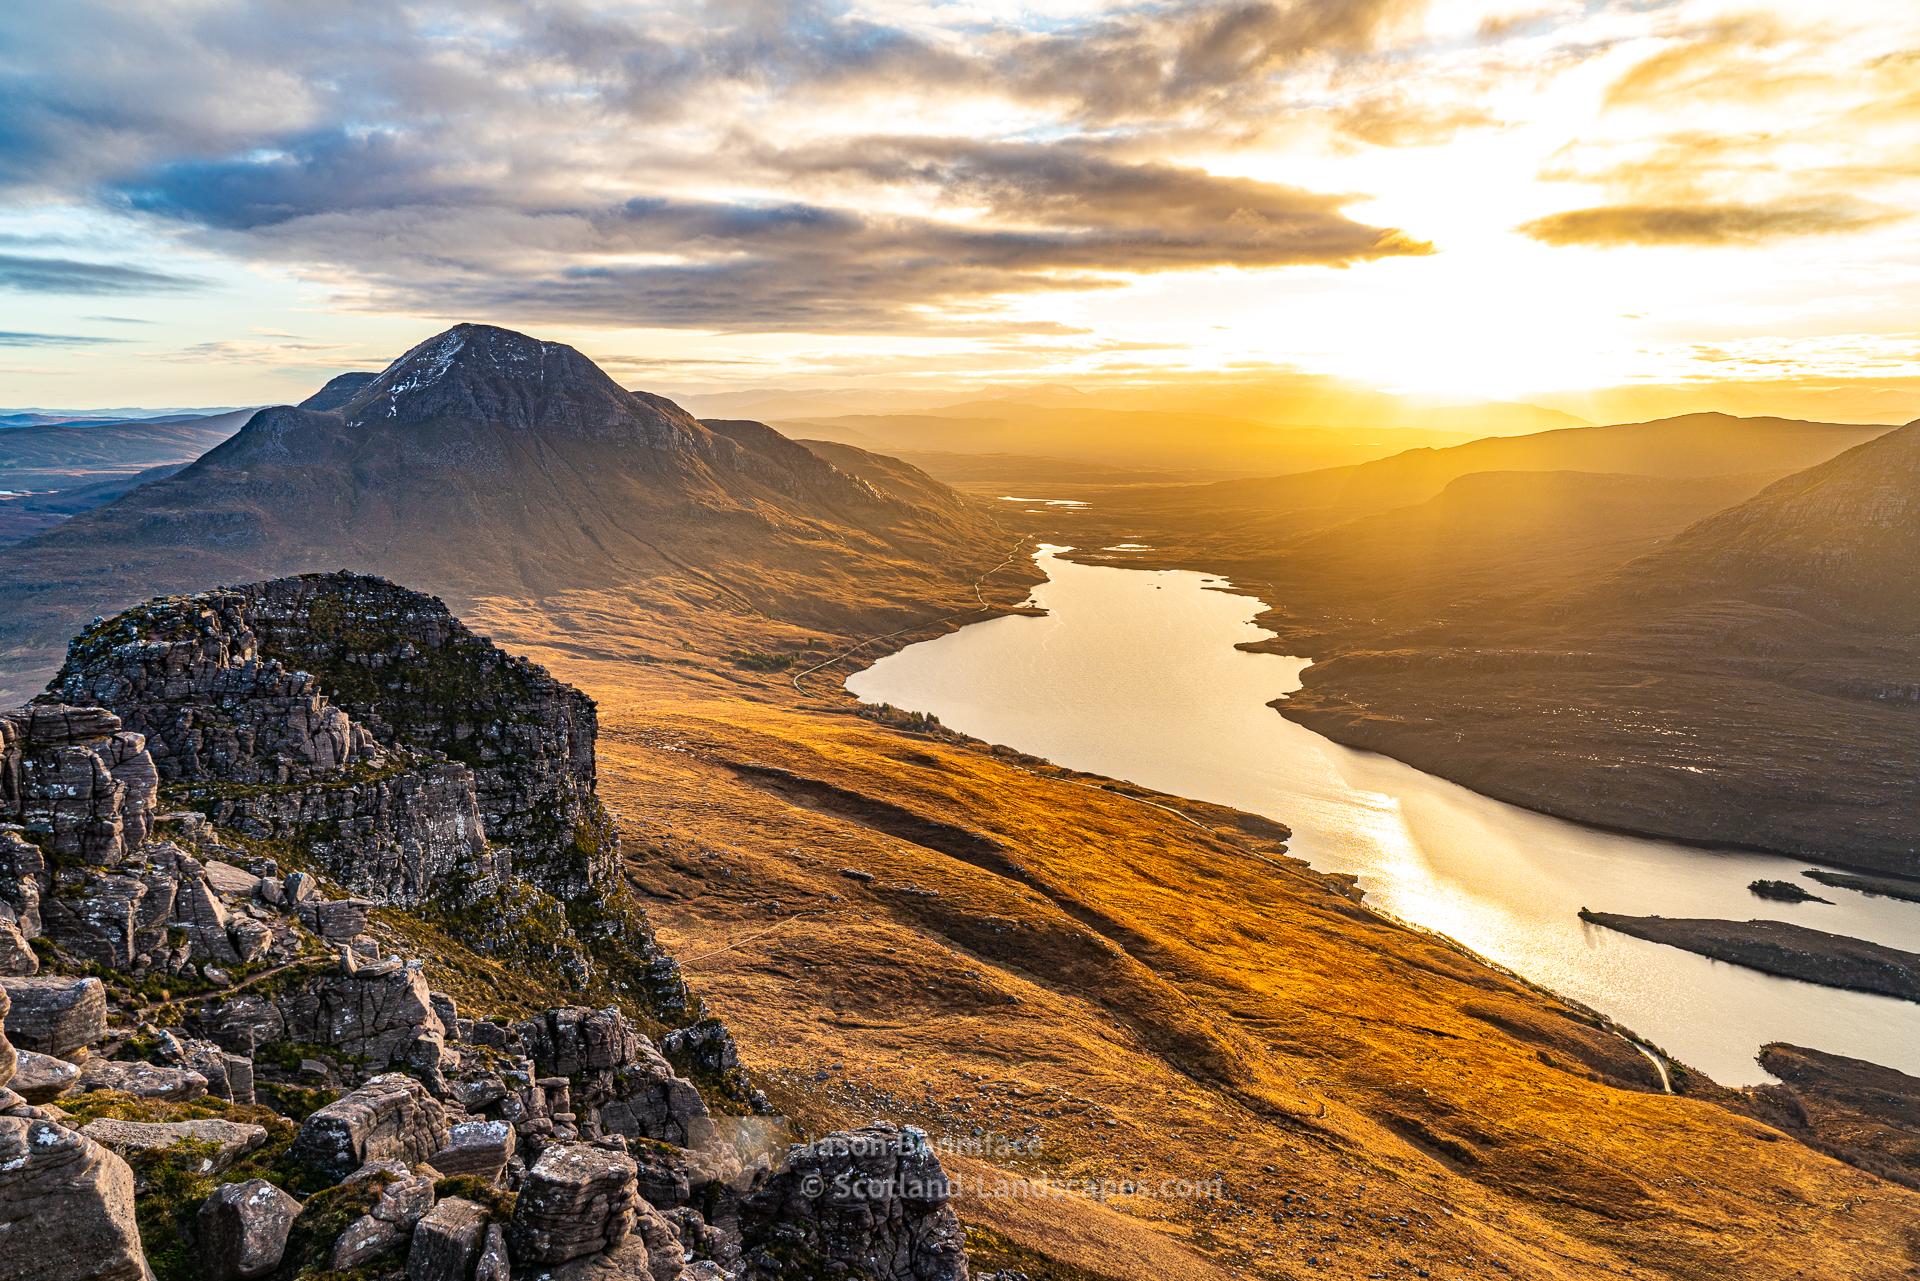 Golden Morning - Loch Lurgainn and Cul Beag, Assynt & Ullapool